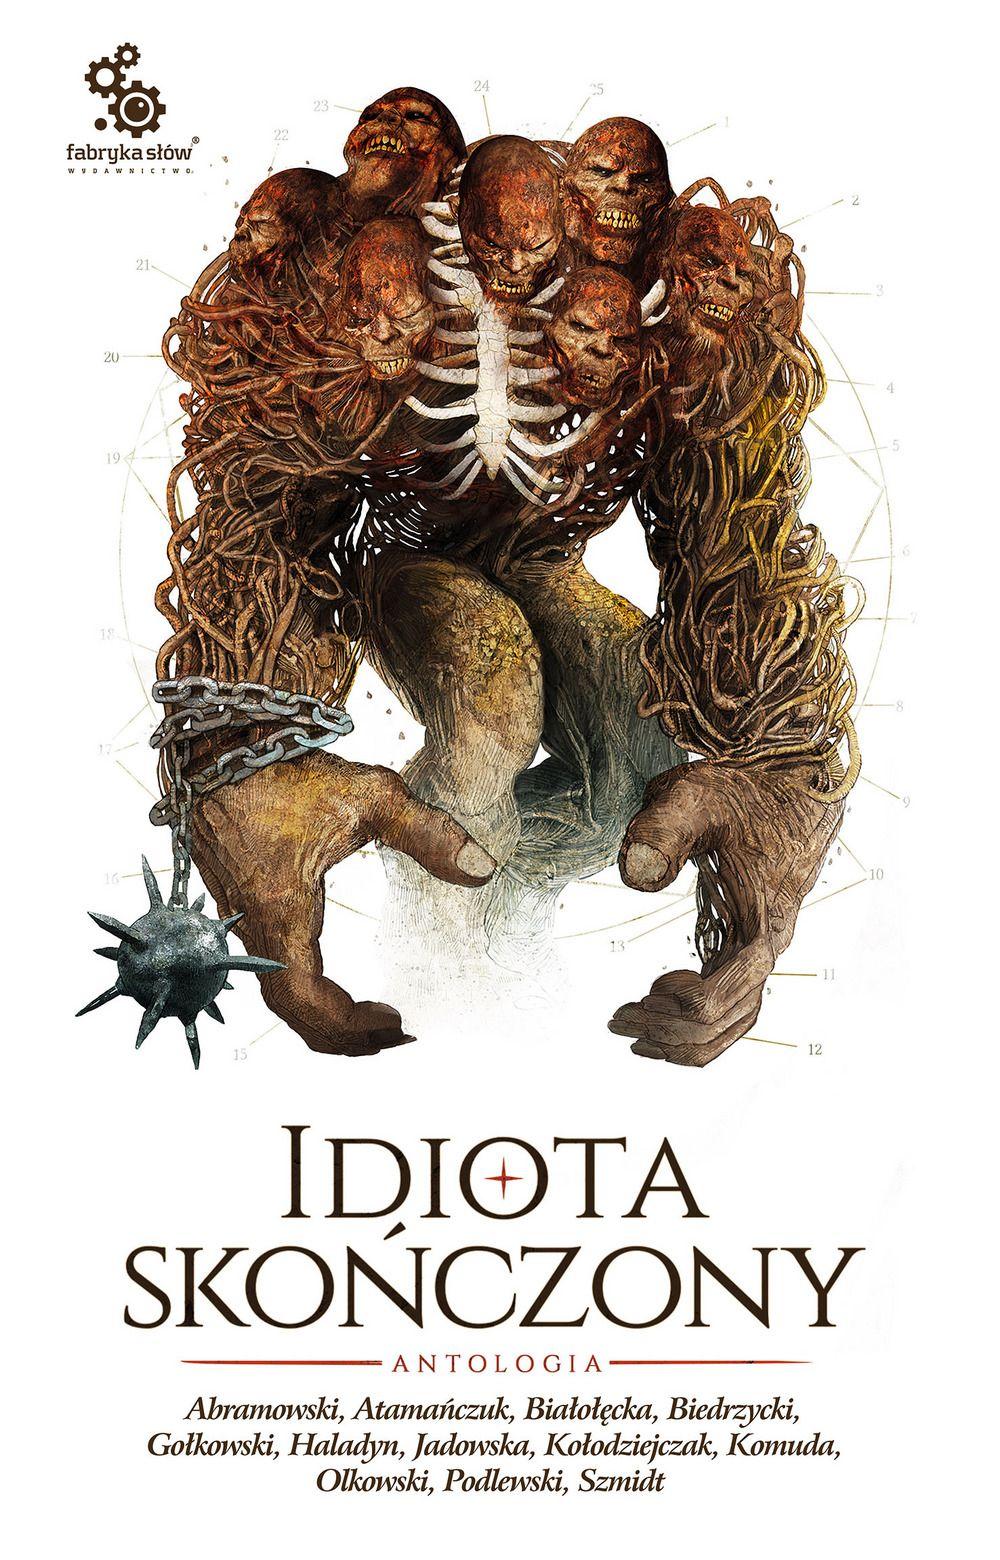 Idiota skończony. Antologia